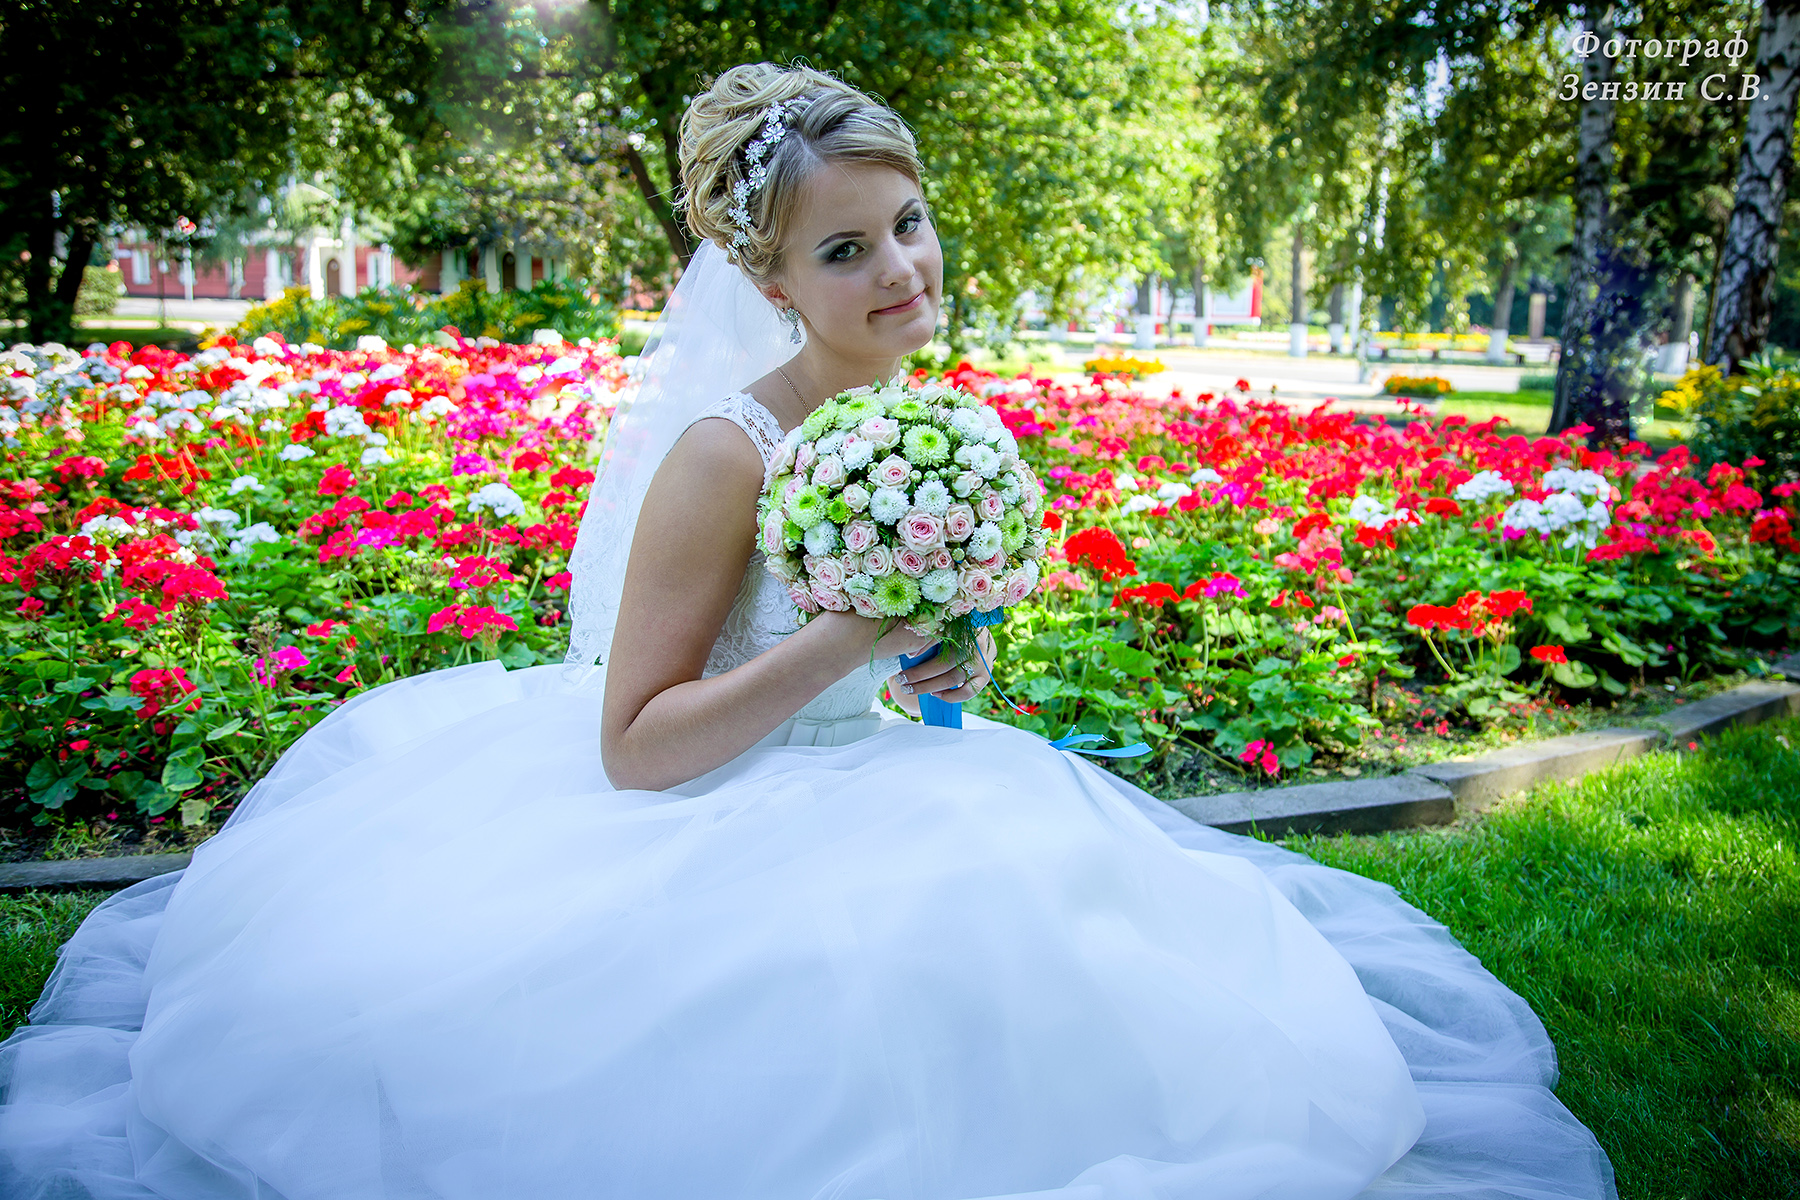 Свадьба Барнаул 19-08-2016 Рафик + Ксения